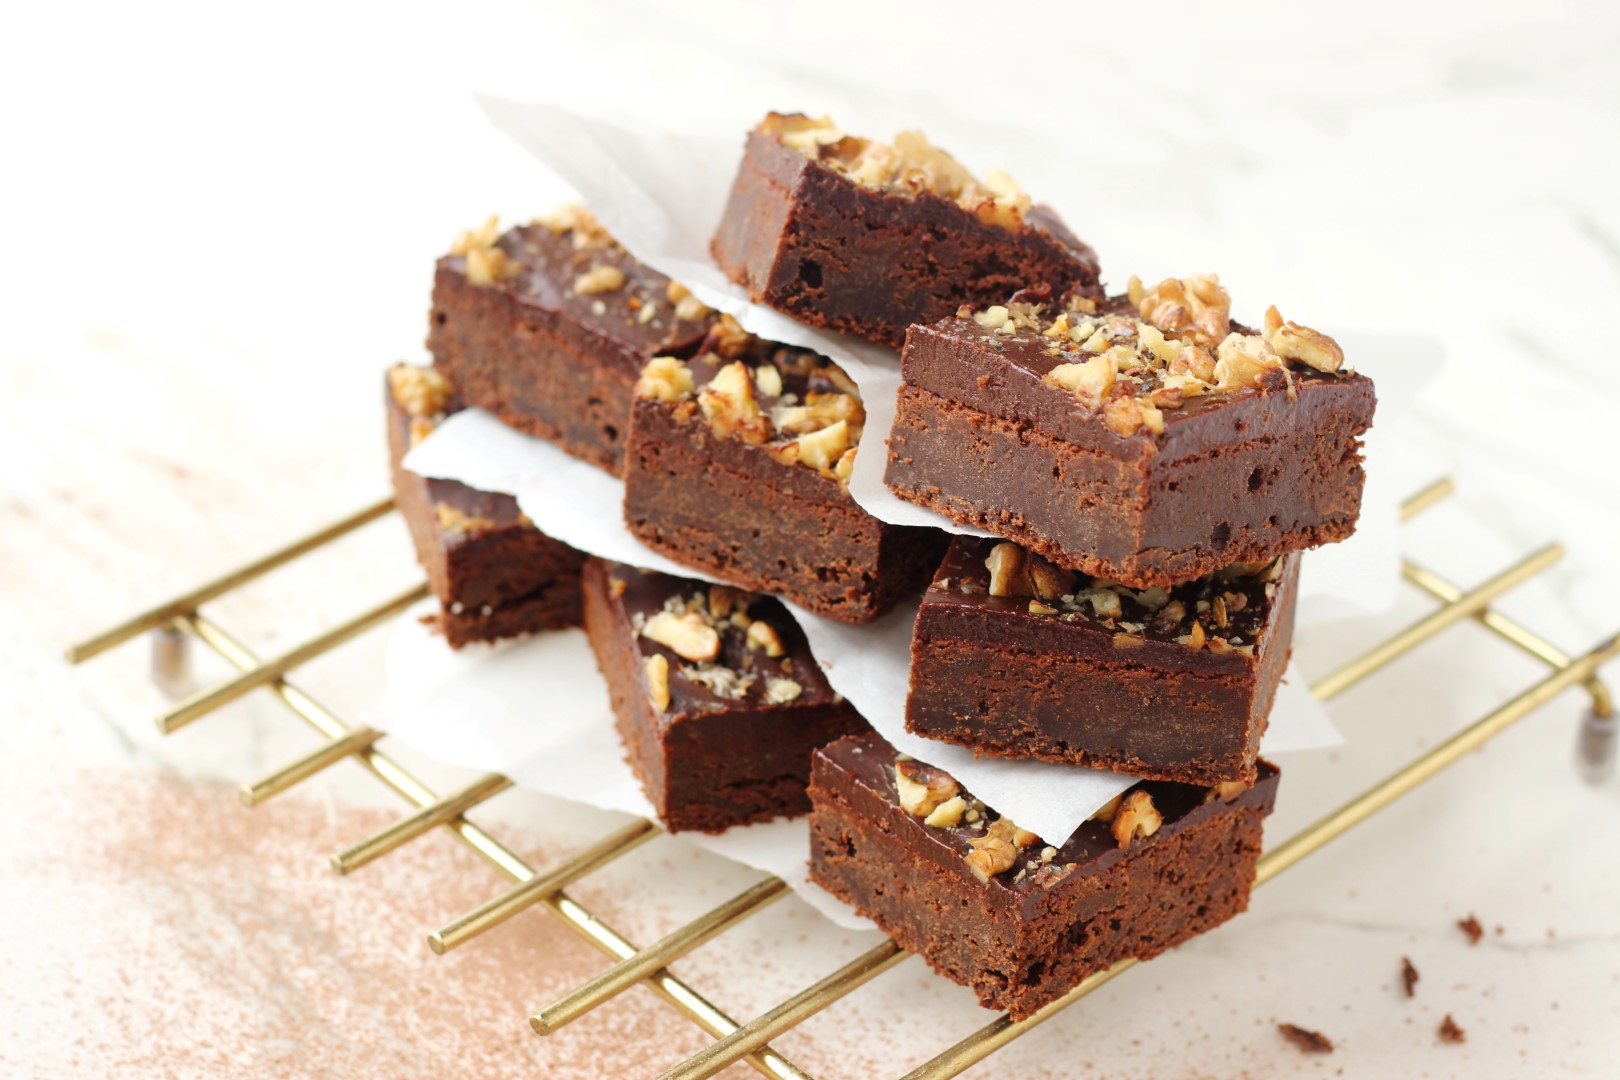 brownies, brownie, chocolate, cerveza negra, stella artois, recetas de cocina, postres,